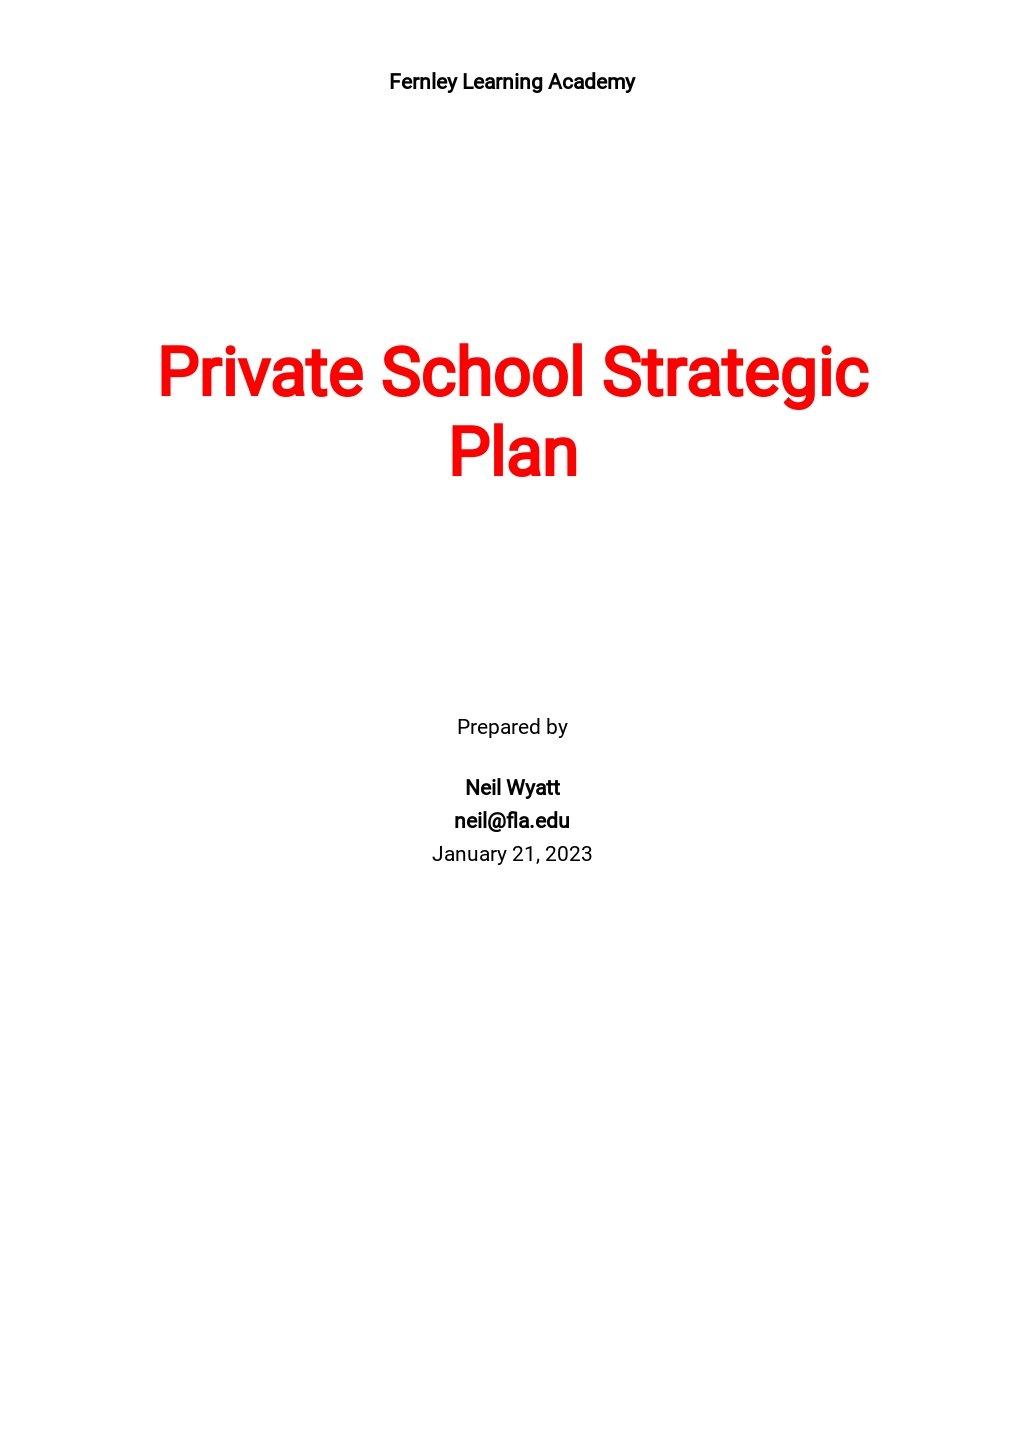 Private School Strategic Plan Template